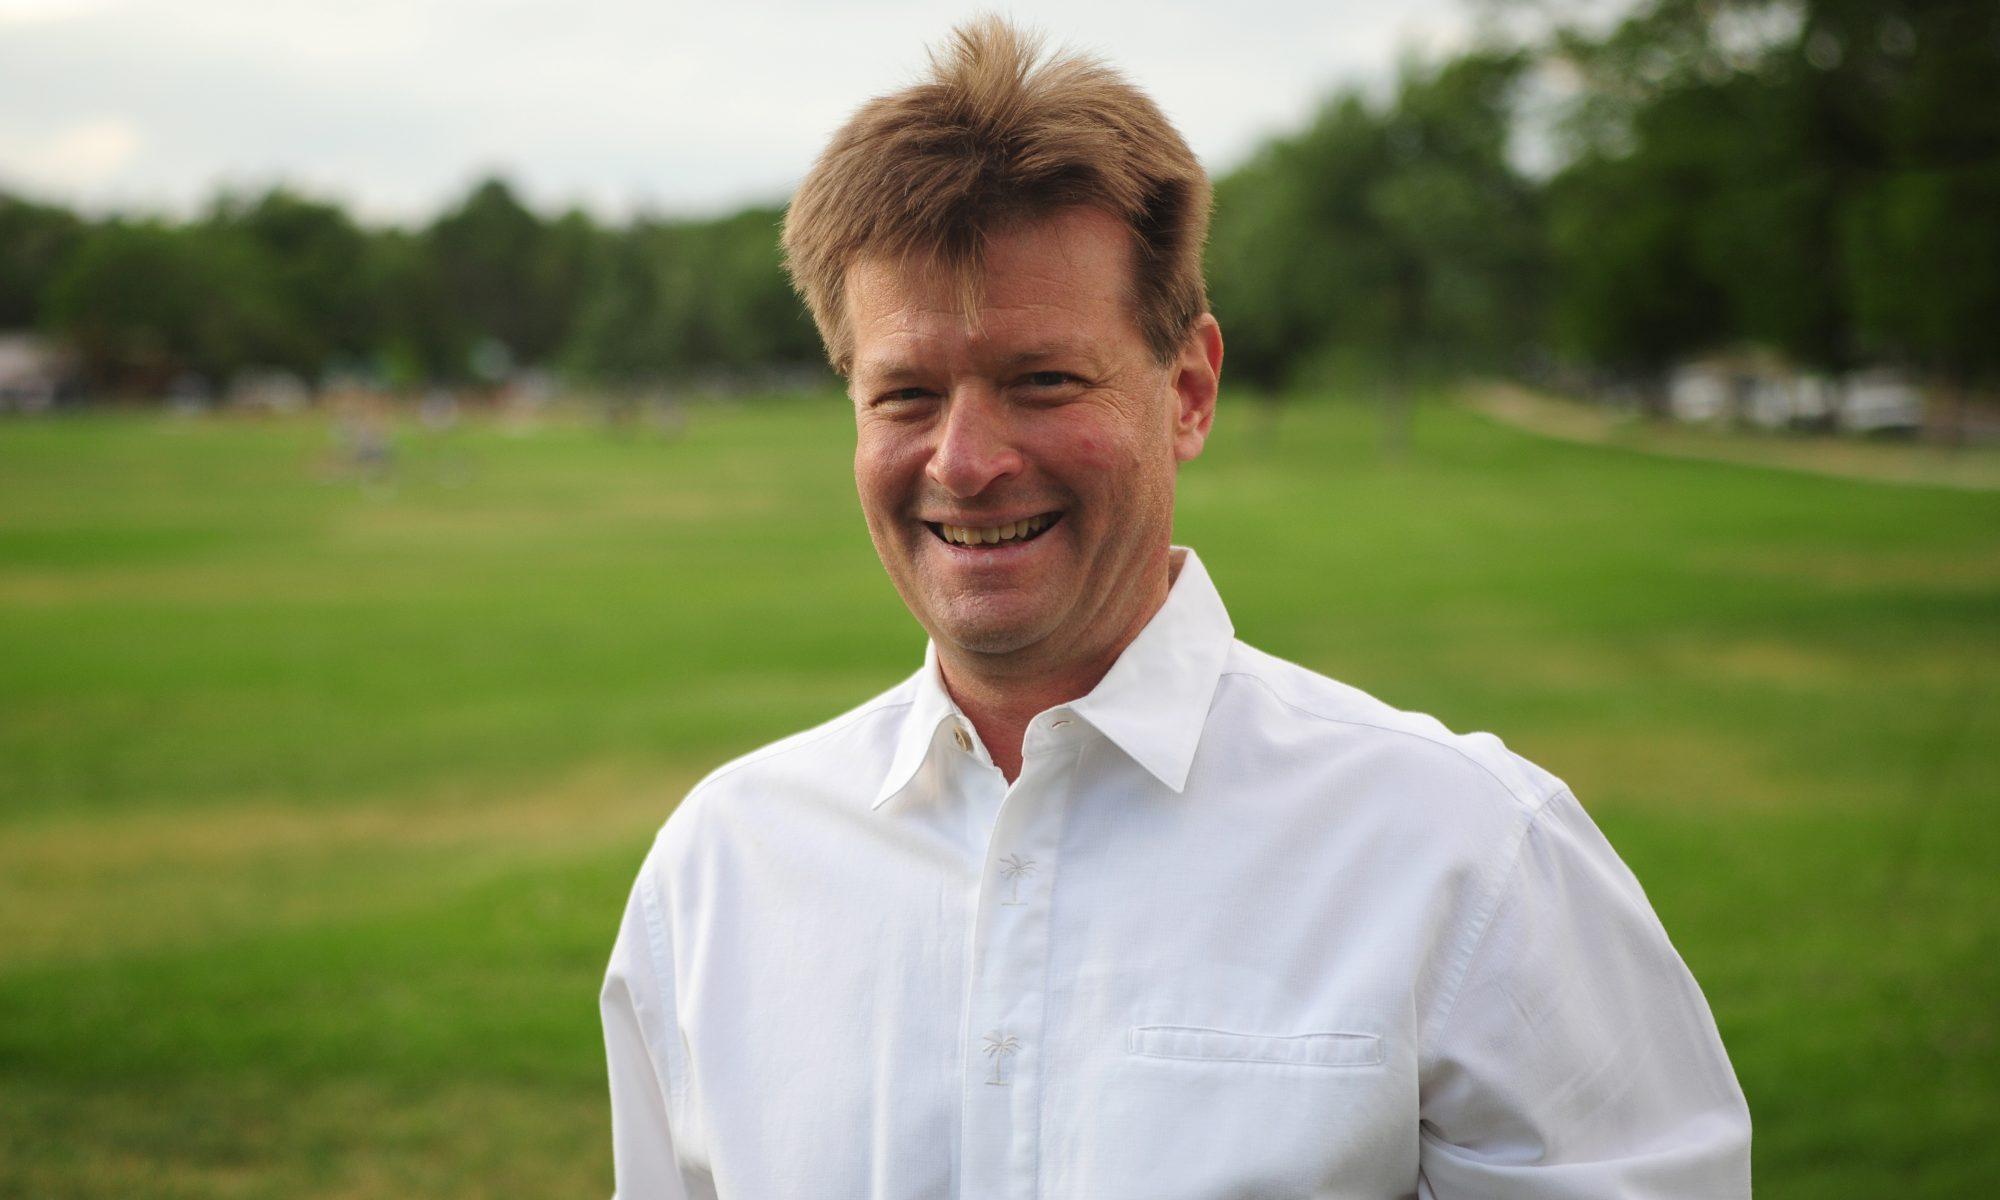 Re-elect Sam Weaver for Boulder City Council